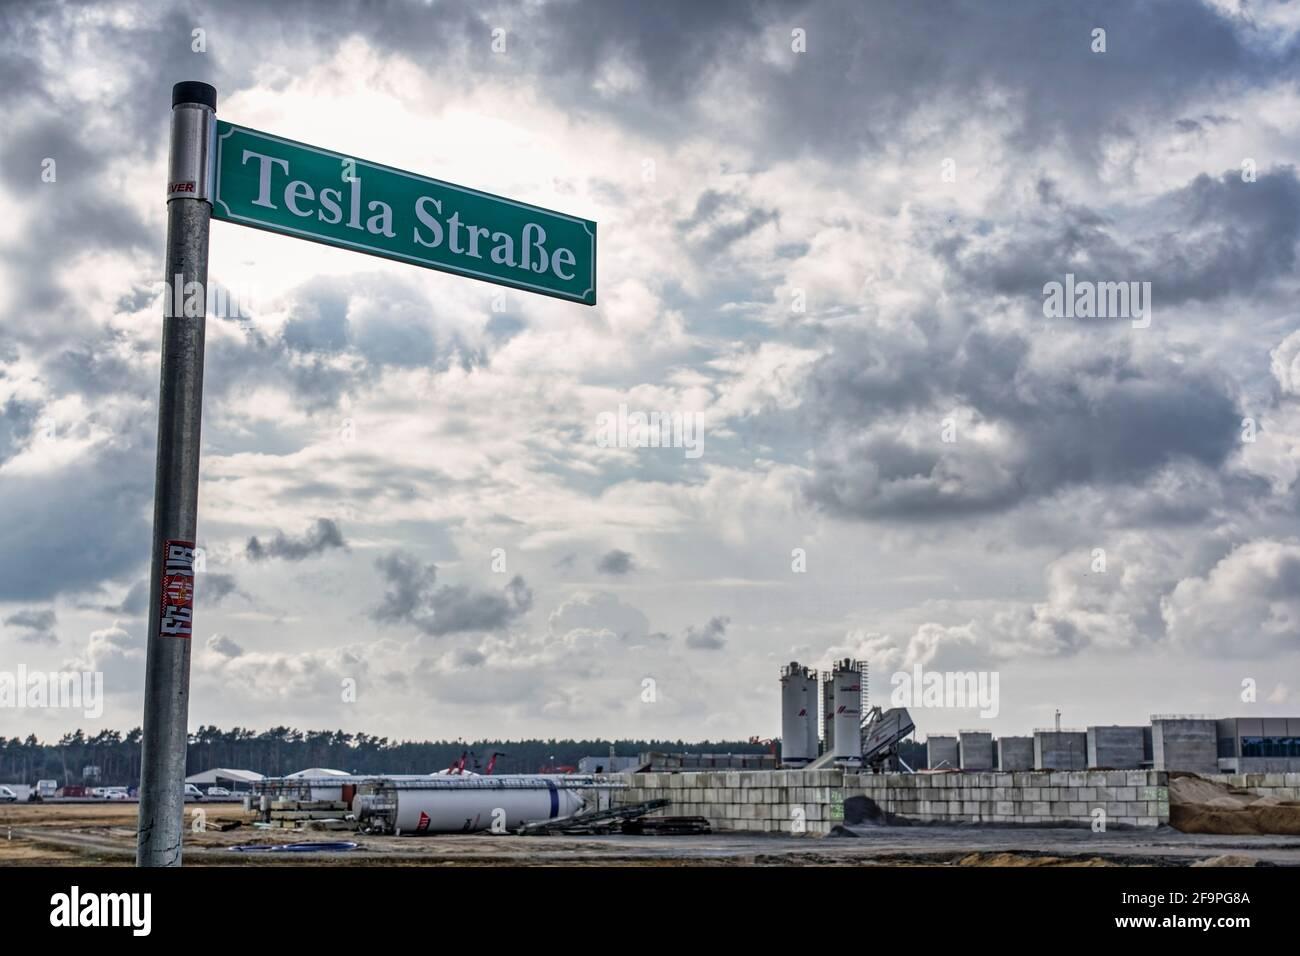 Tesla Gigafactory Grünheide, Brandenburg, Tesla Straße, Schild, Baustelle, Mark Brandenburg, Berlin , Deutschland, Europa Stock Photo